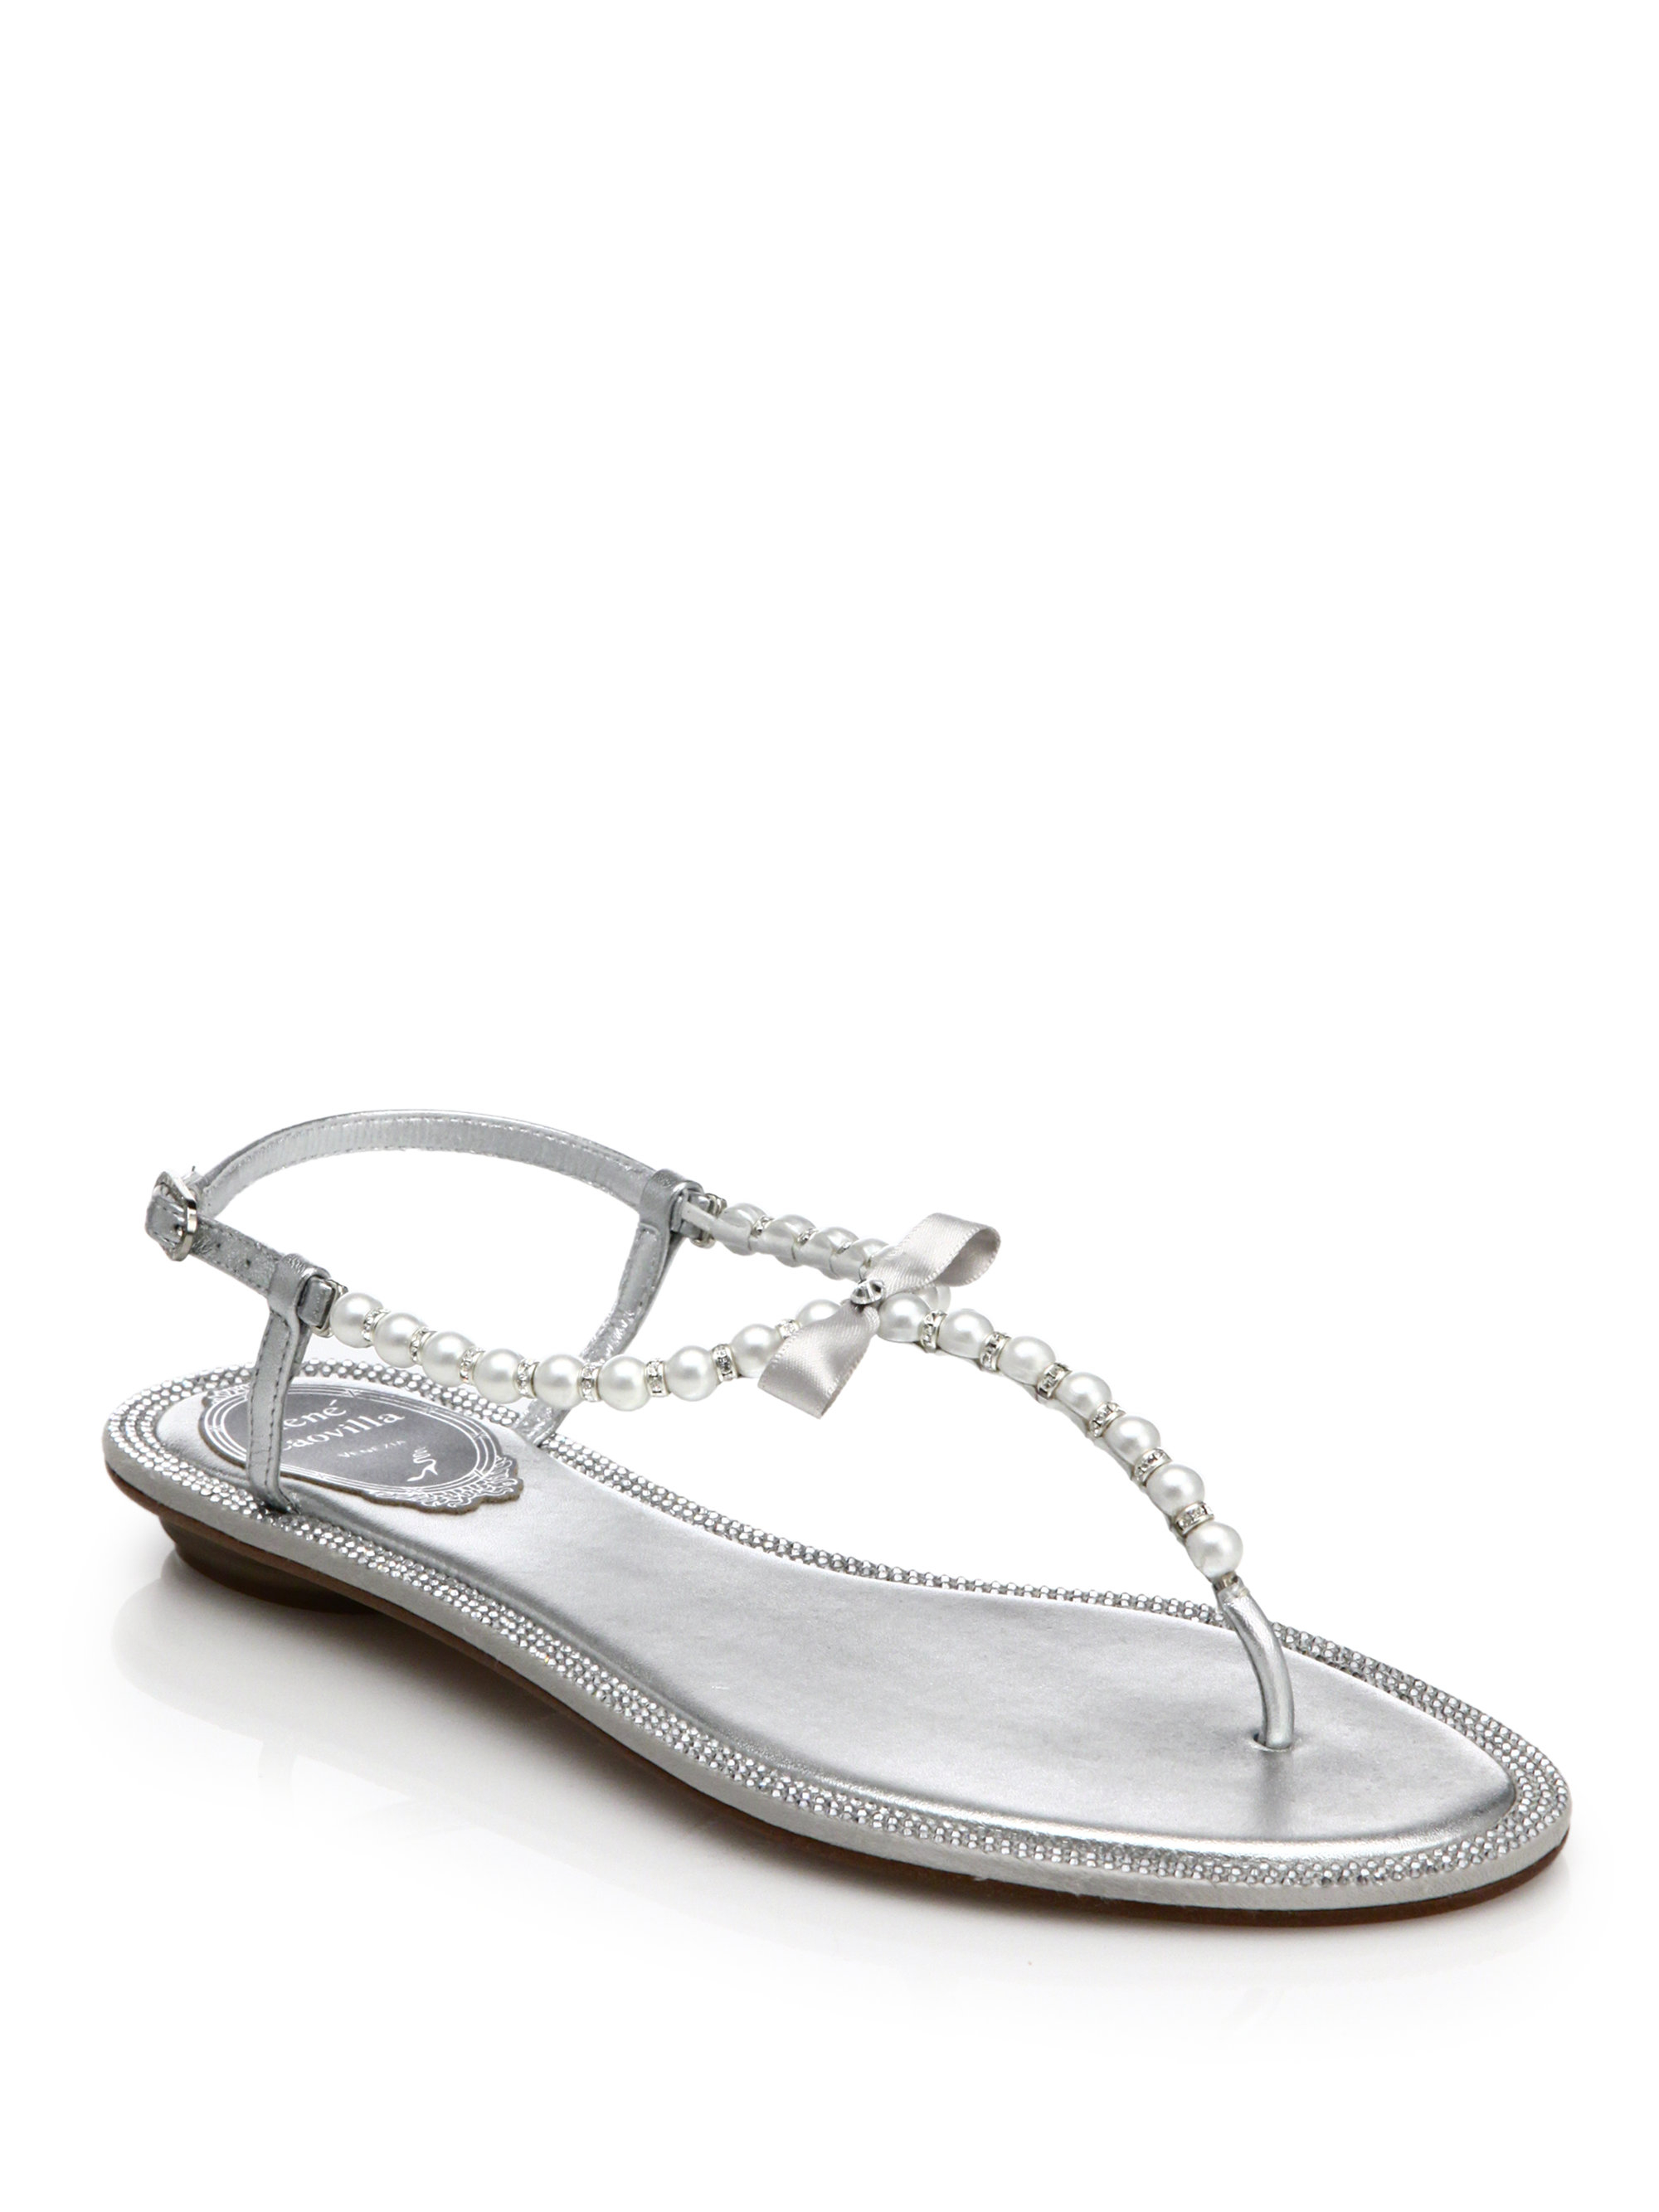 2c3c37e4a Lyst - Rene Caovilla Pearl And Rhinestone Metallic Leather Sandals ...